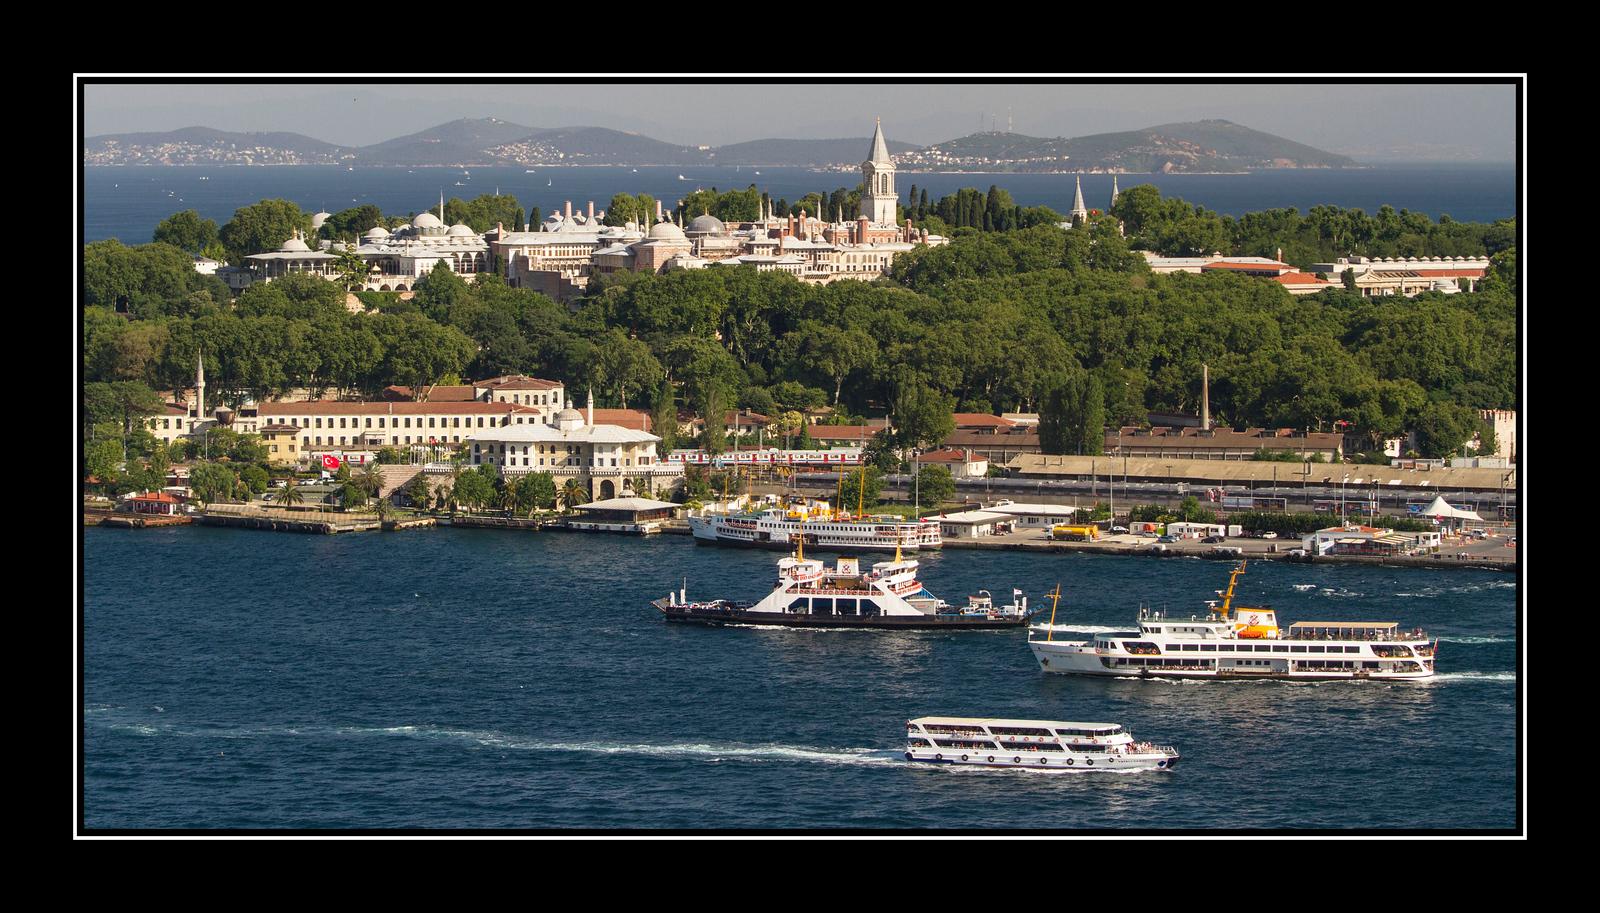 IMAGE: https://photos.smugmug.com/Travel/Istanbul/i-qjjvL8J/0/ecf98f6b/X3/Golden%20Horn%20traffic-X3.jpg